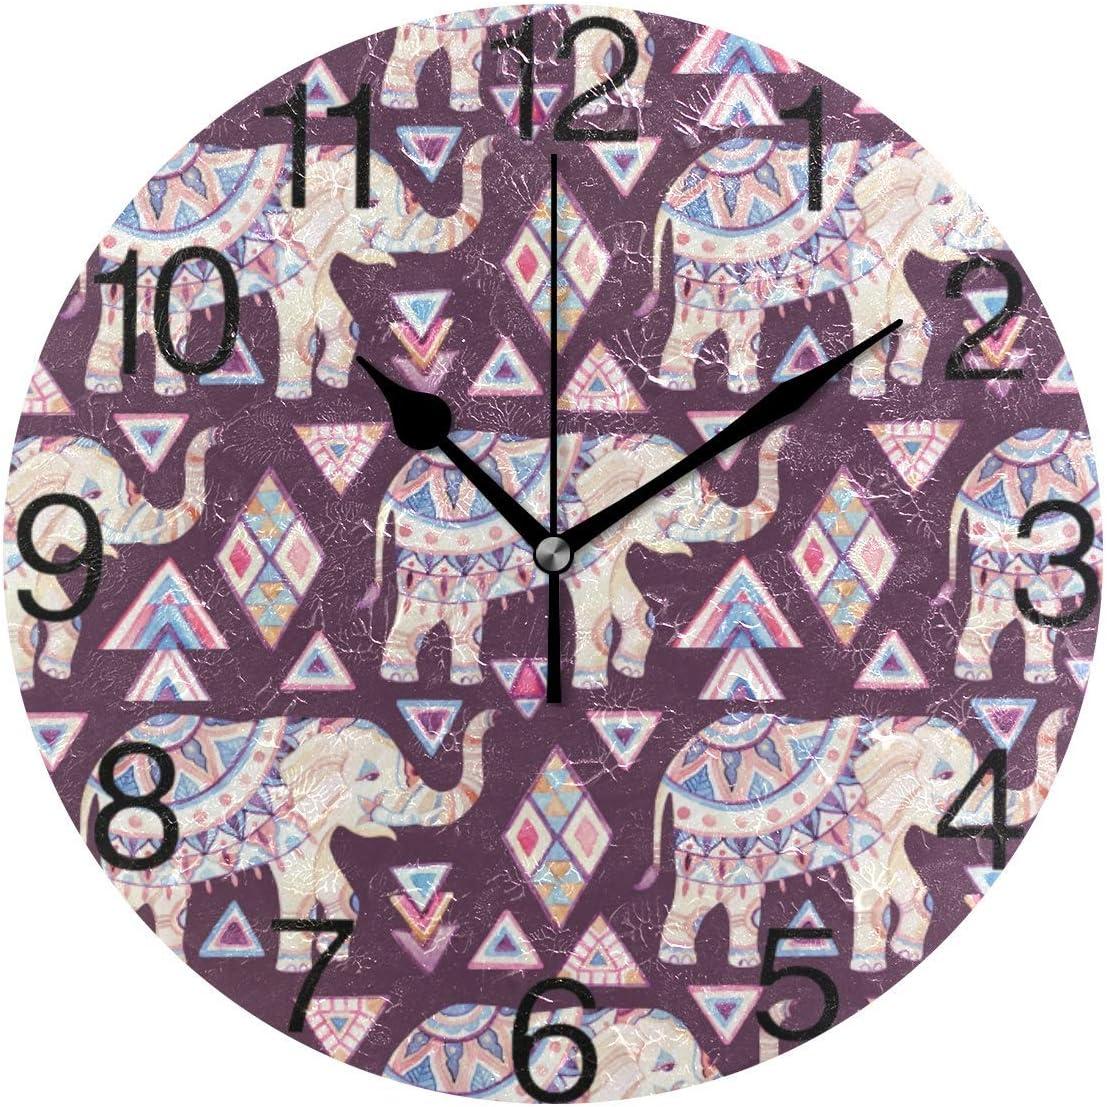 Bit Indian Elephant - Reloj decorativo para pared ...